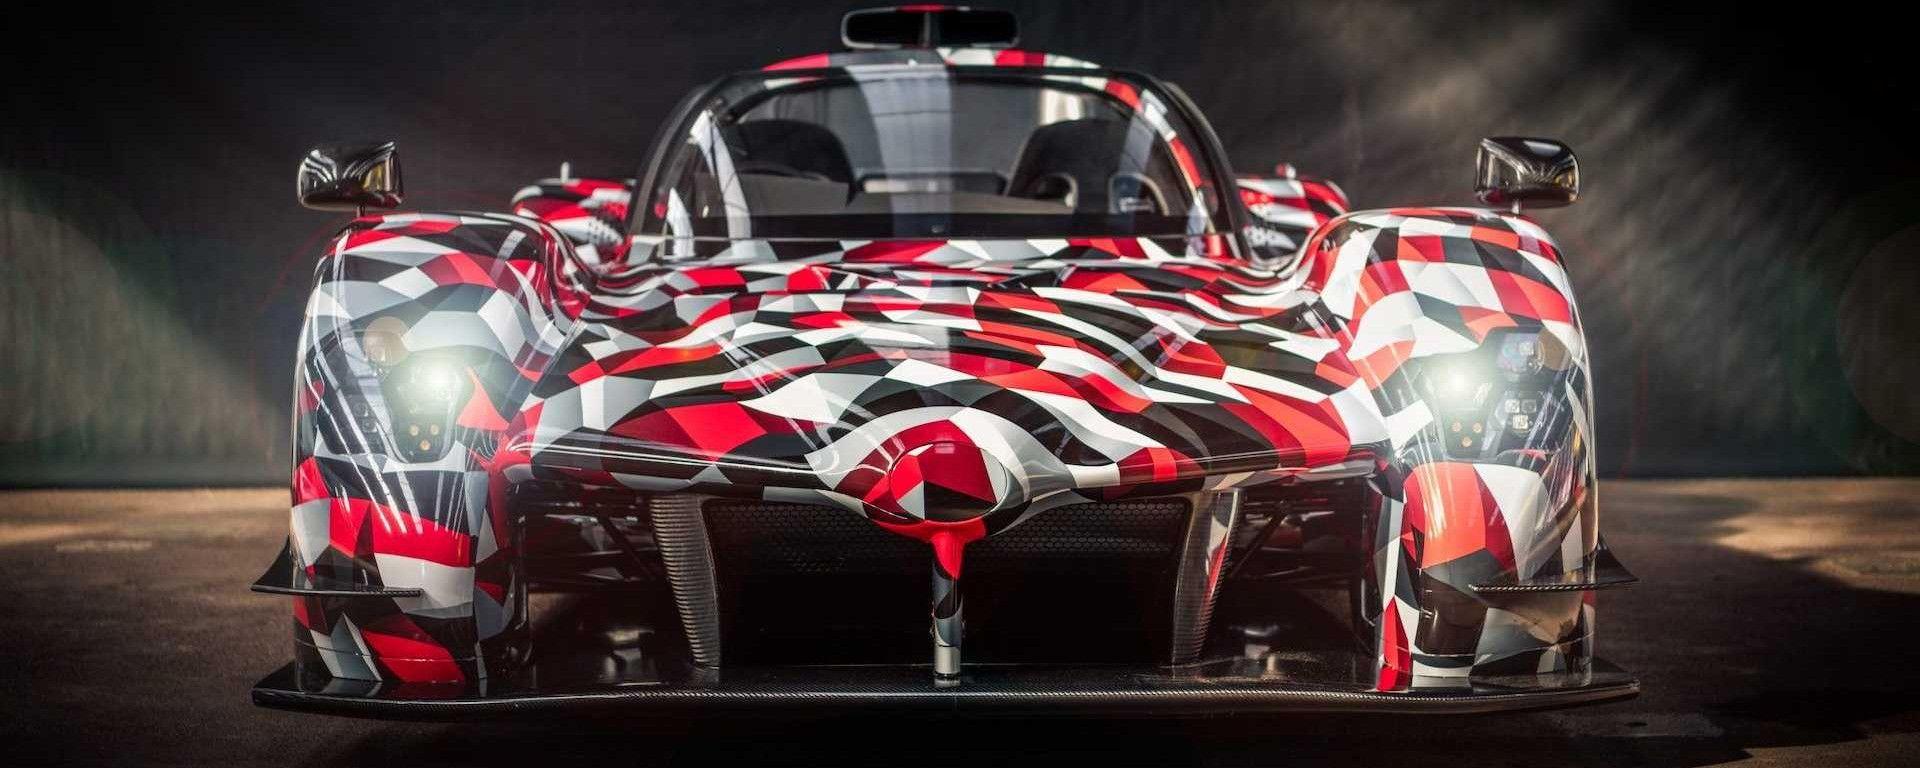 Toyota GR Super Sport: frontale